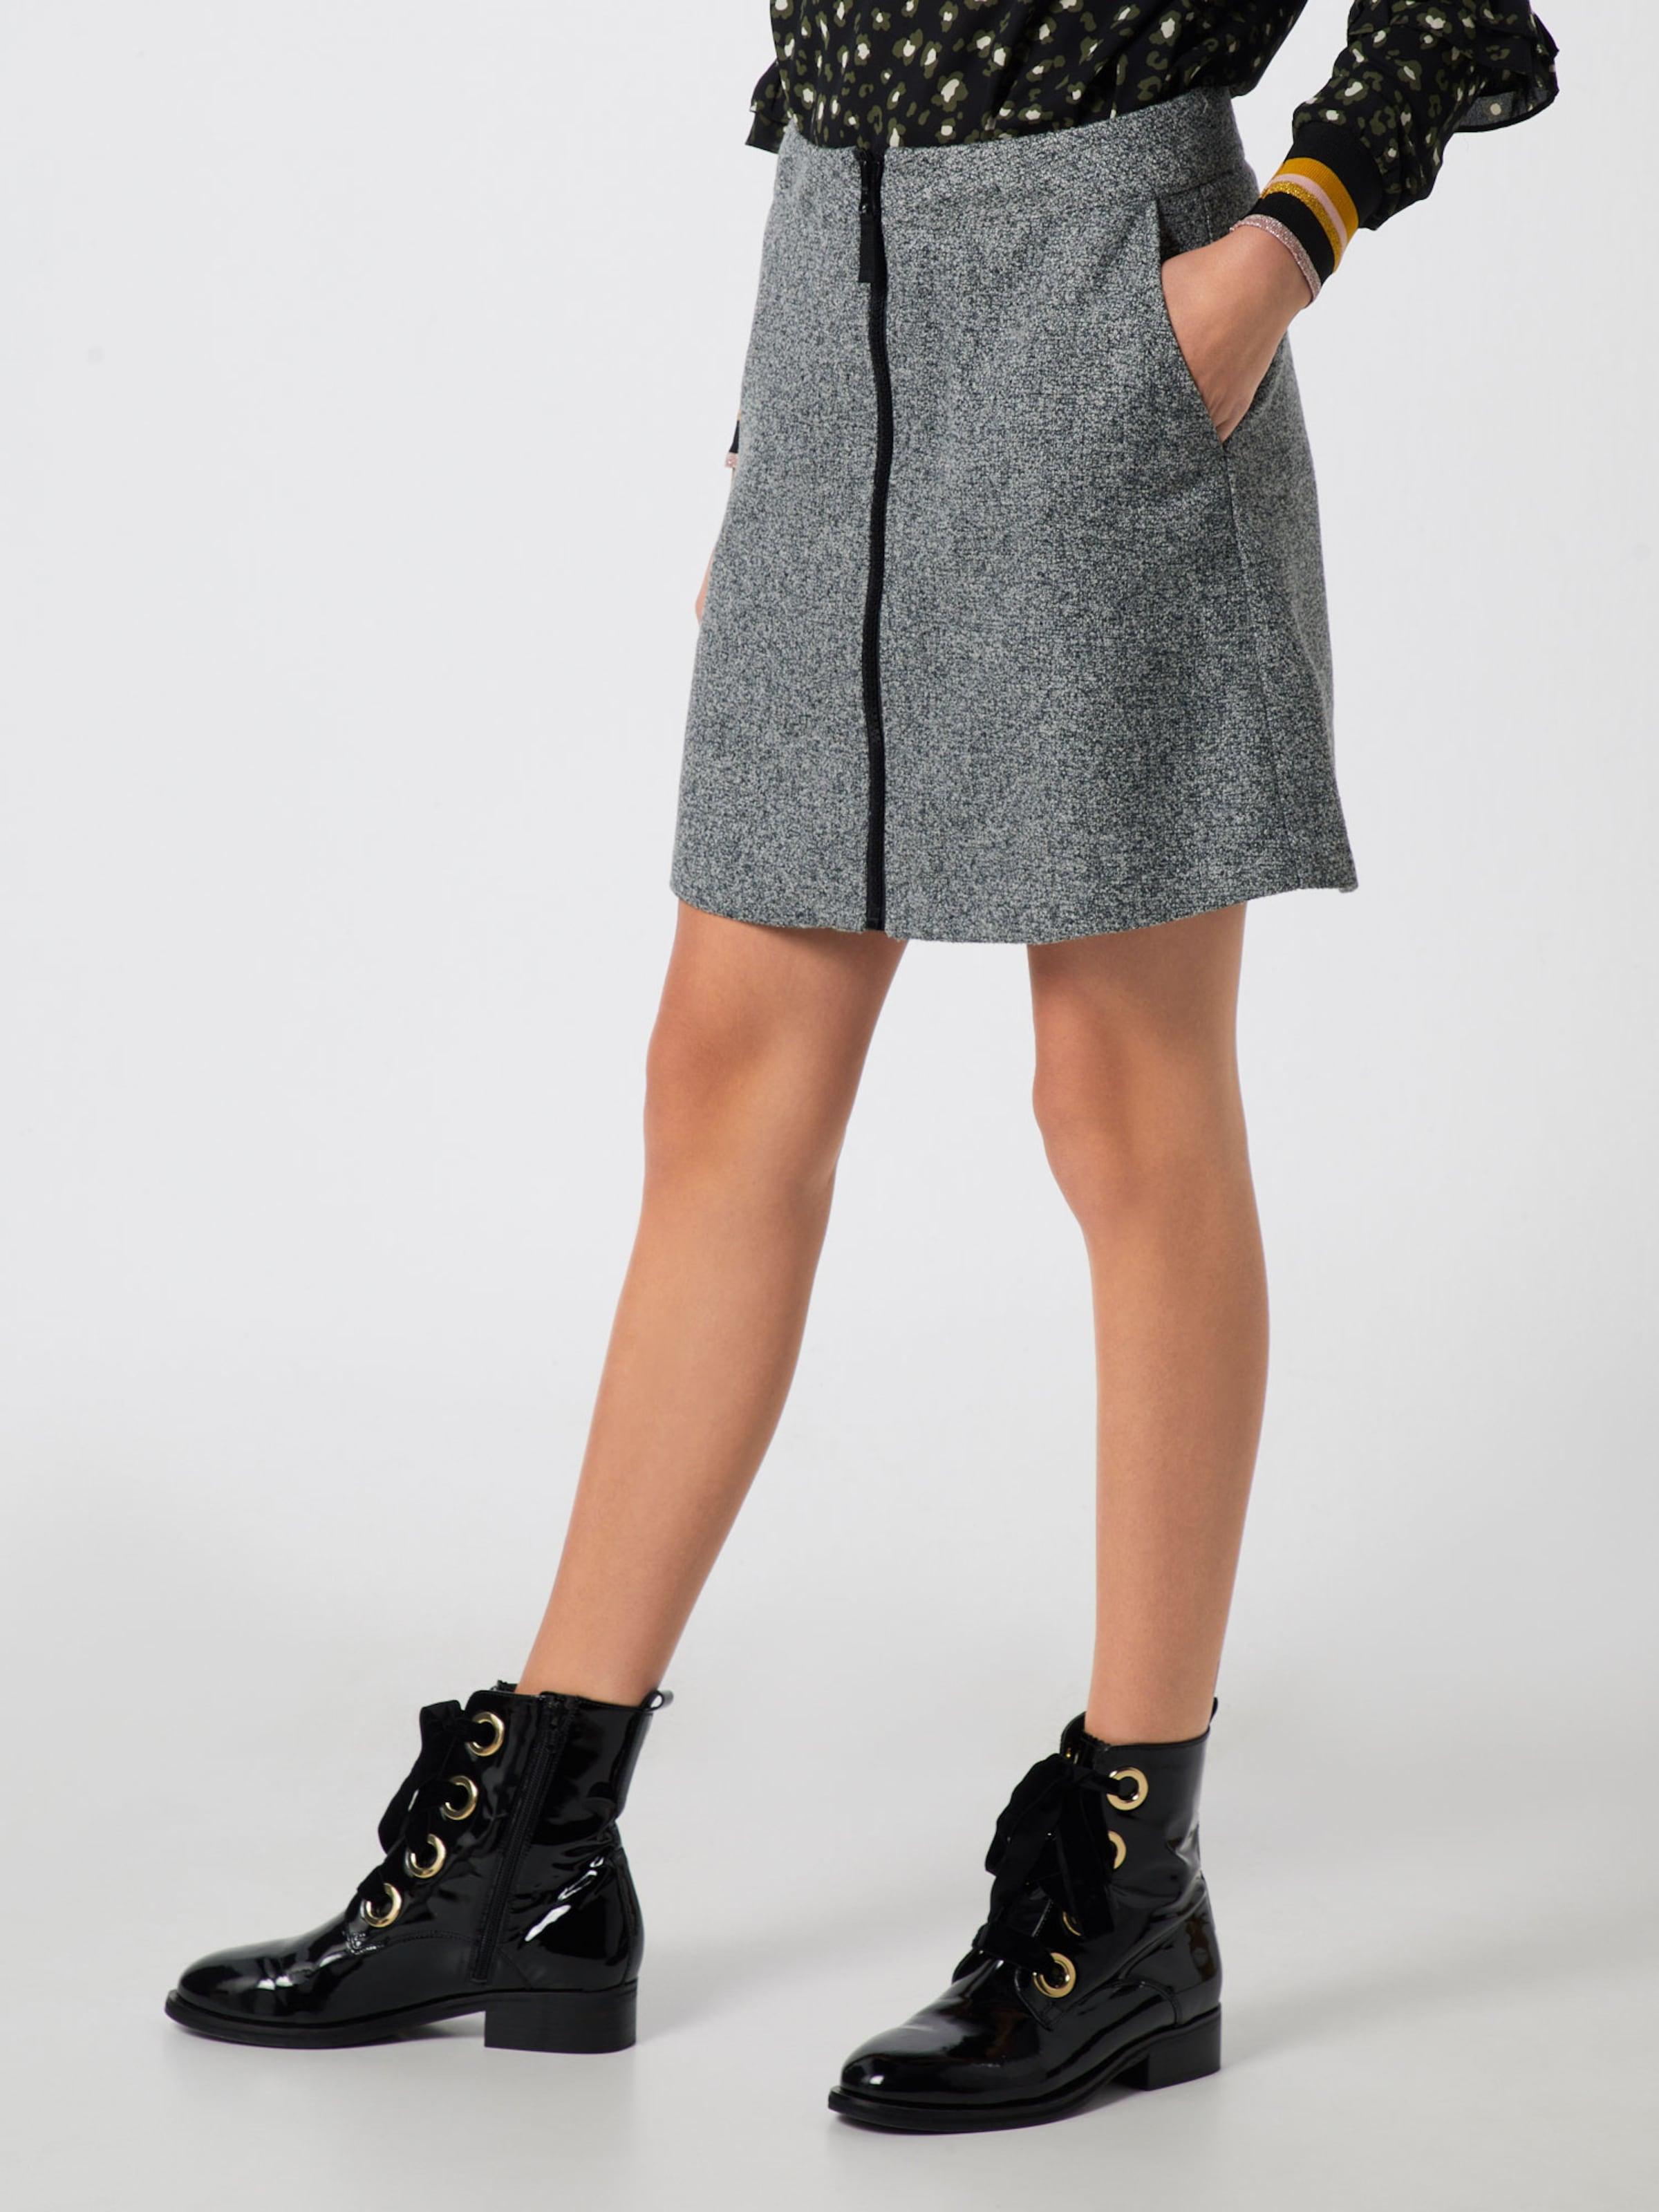 Re Skirt' Graumeliert draft 'zip Rock In ARL3qcj54